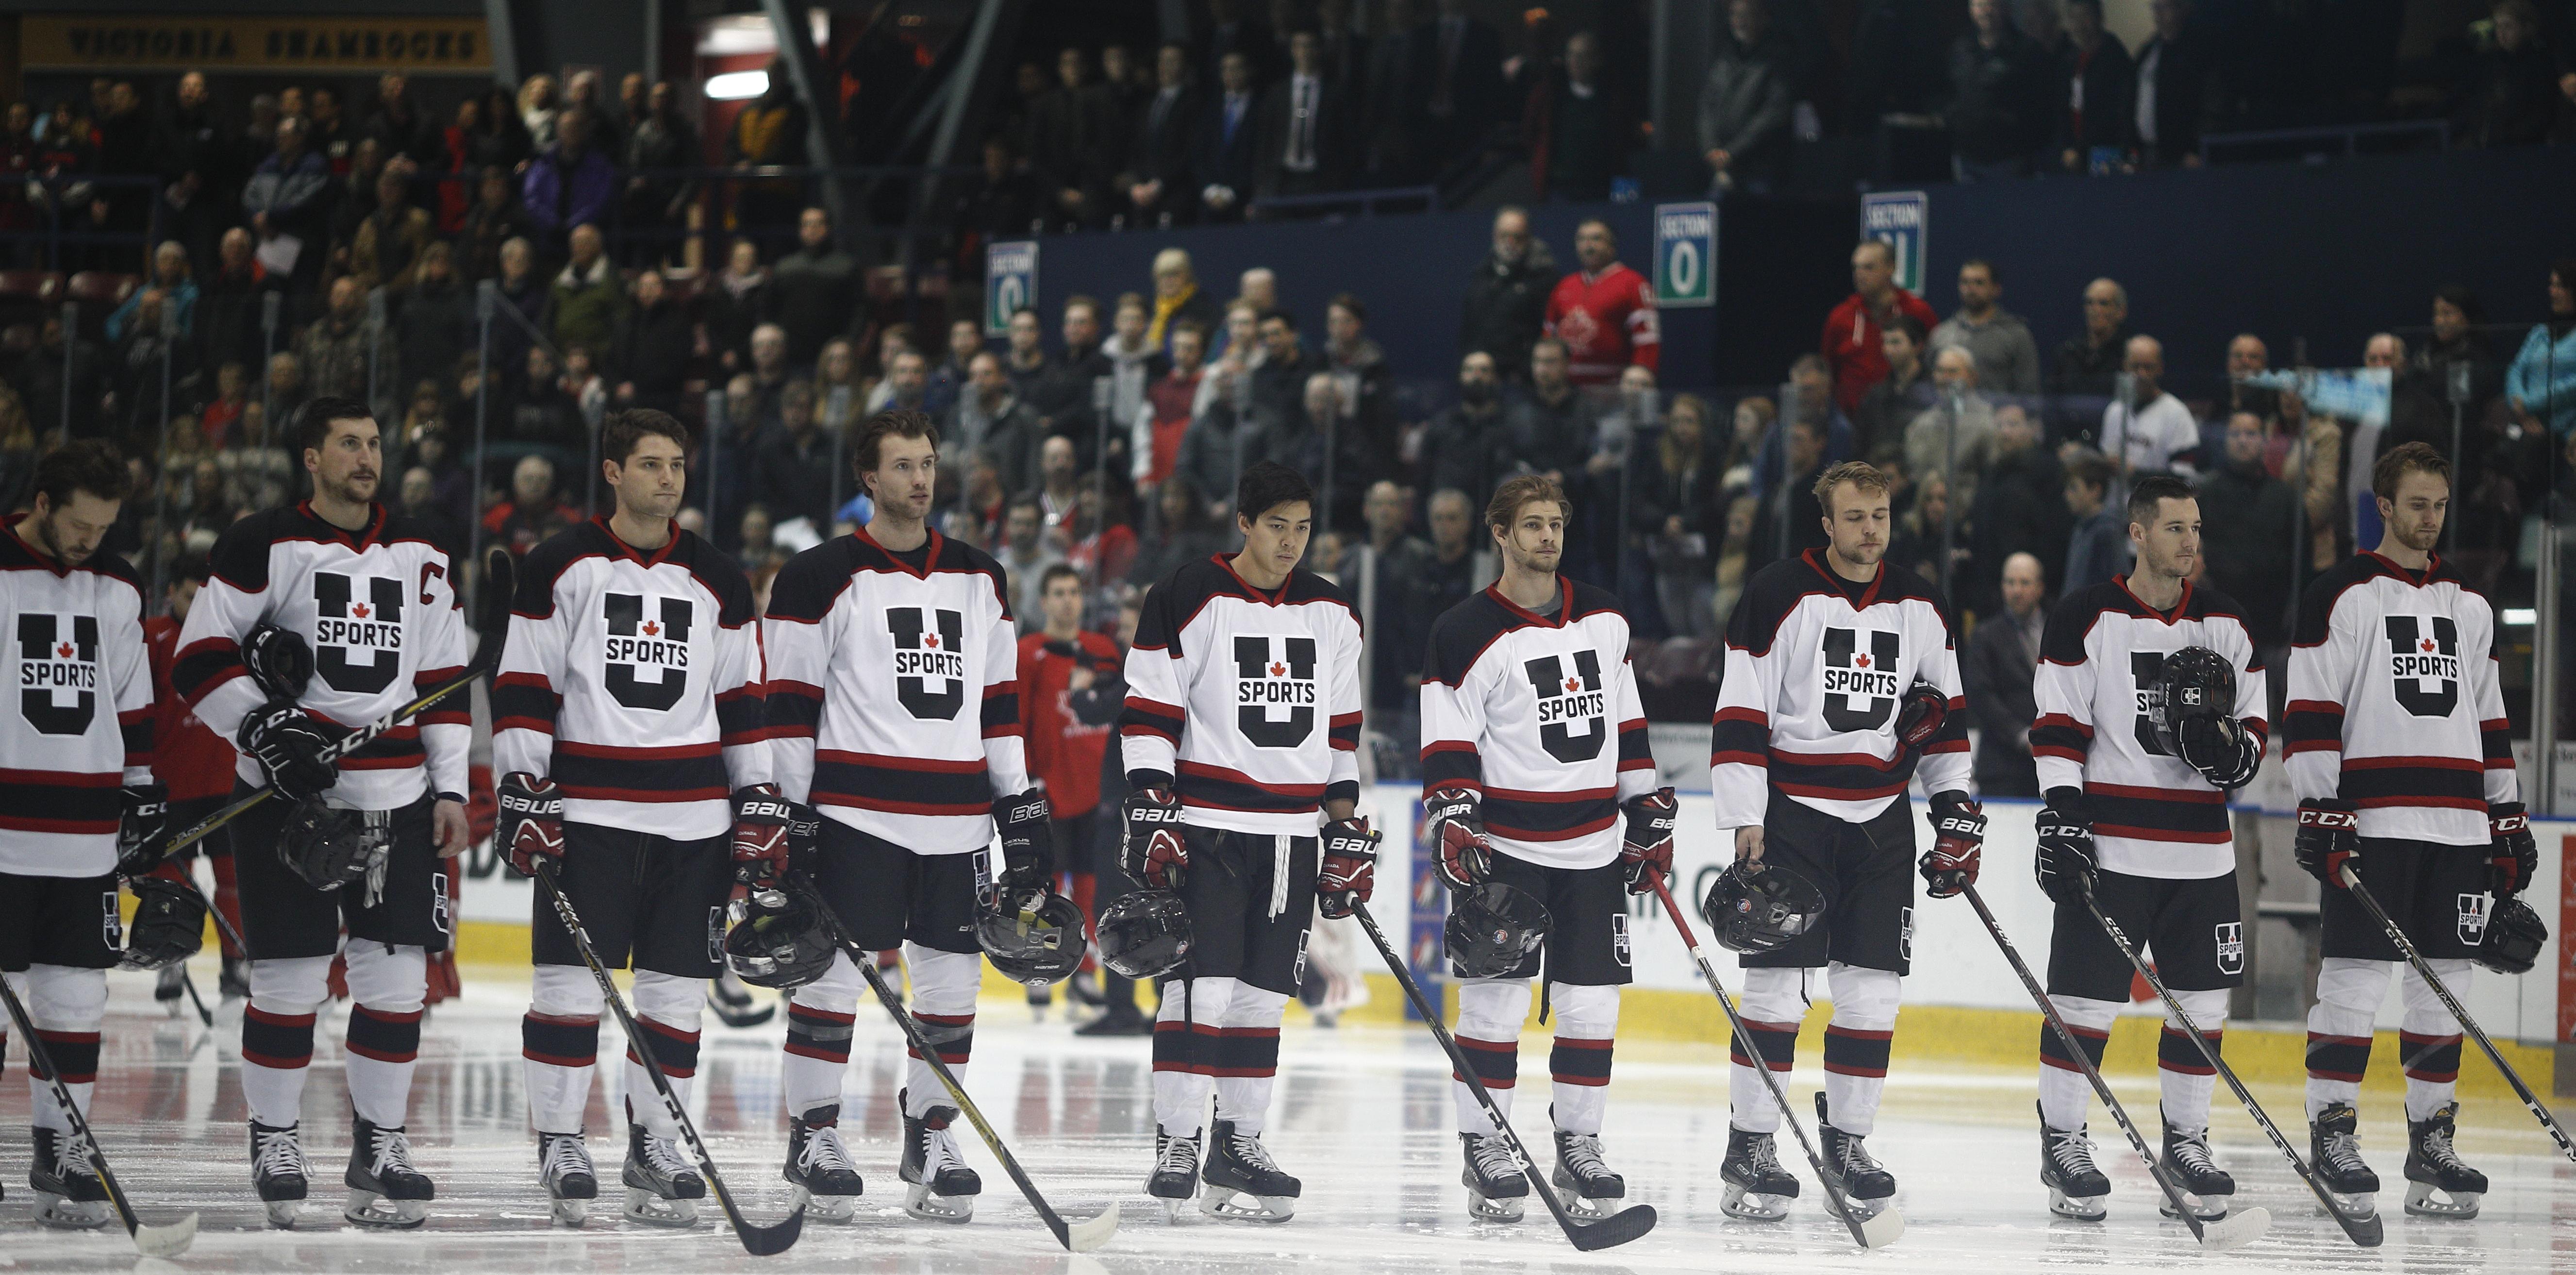 Hockey_Canada_vs_USport_Dec_13_2018_cKevinLightPhoto_EVL2975.JPG (11.34 MB)